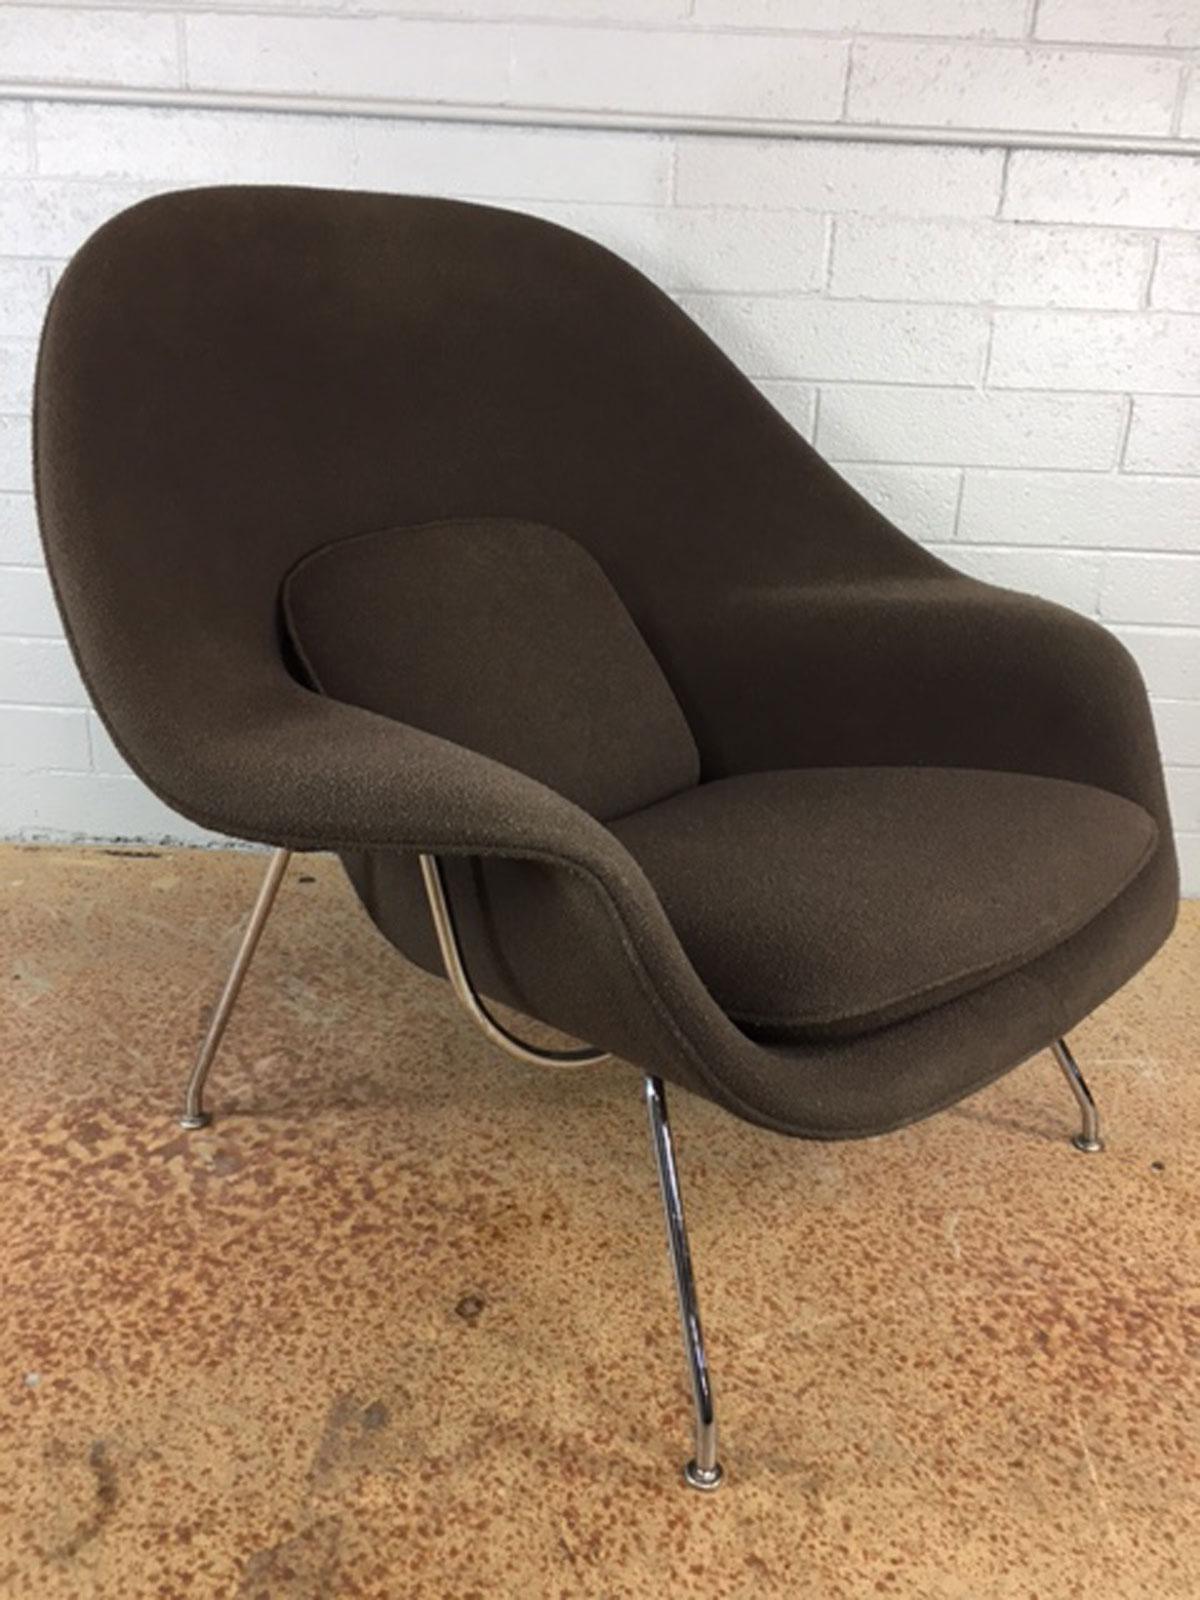 Eero Saarinen Womb Chair By Knoll   Image 2 Of 9